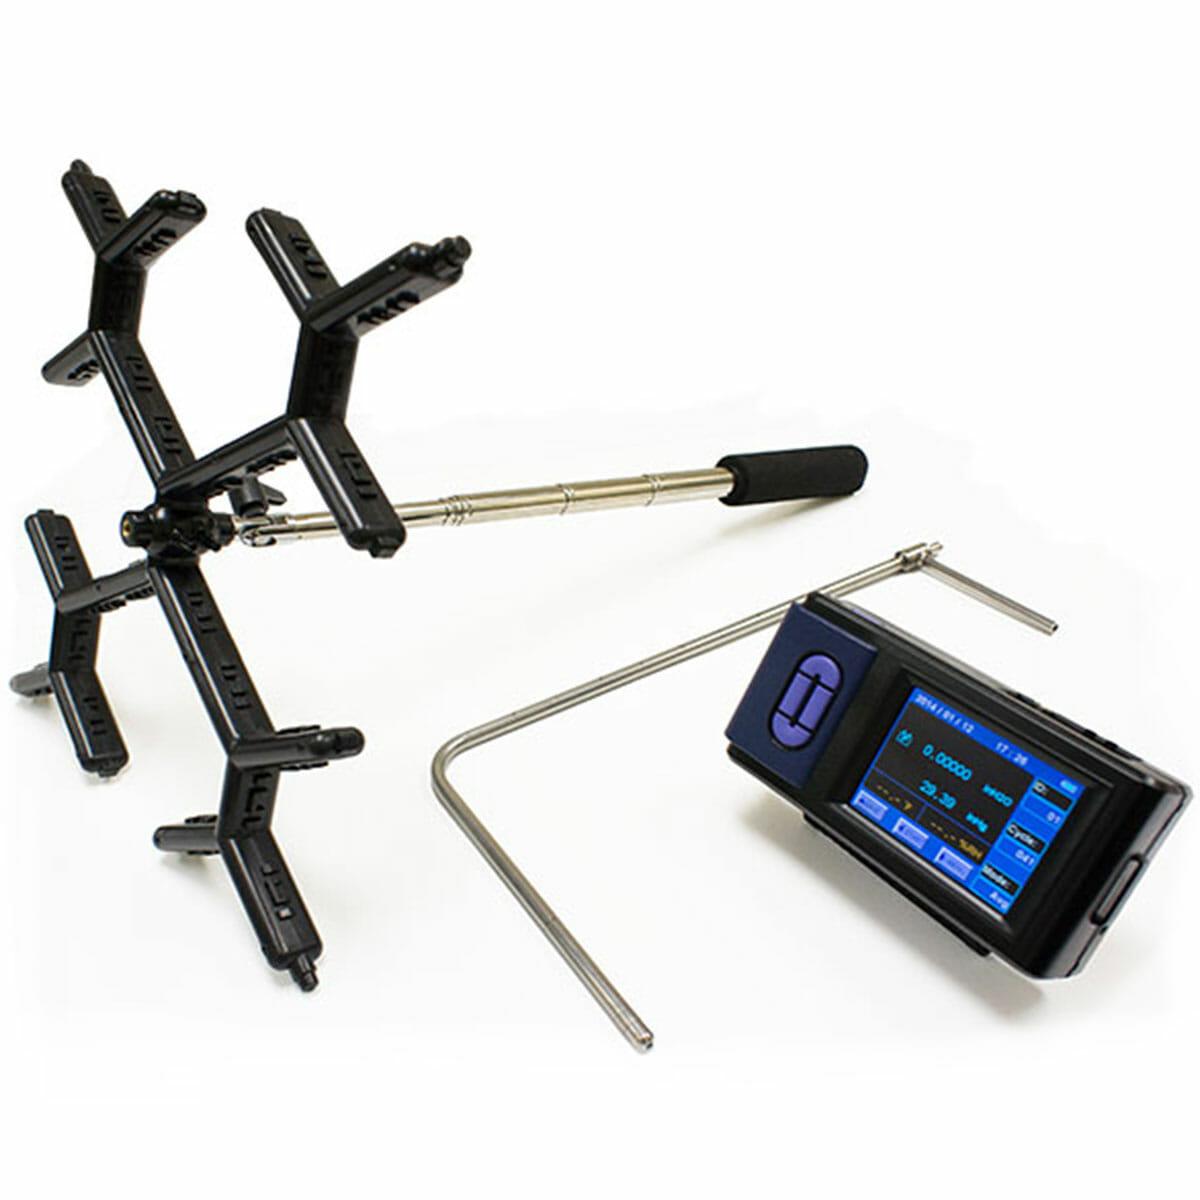 Handheld Micromanometer 6700 Accessories